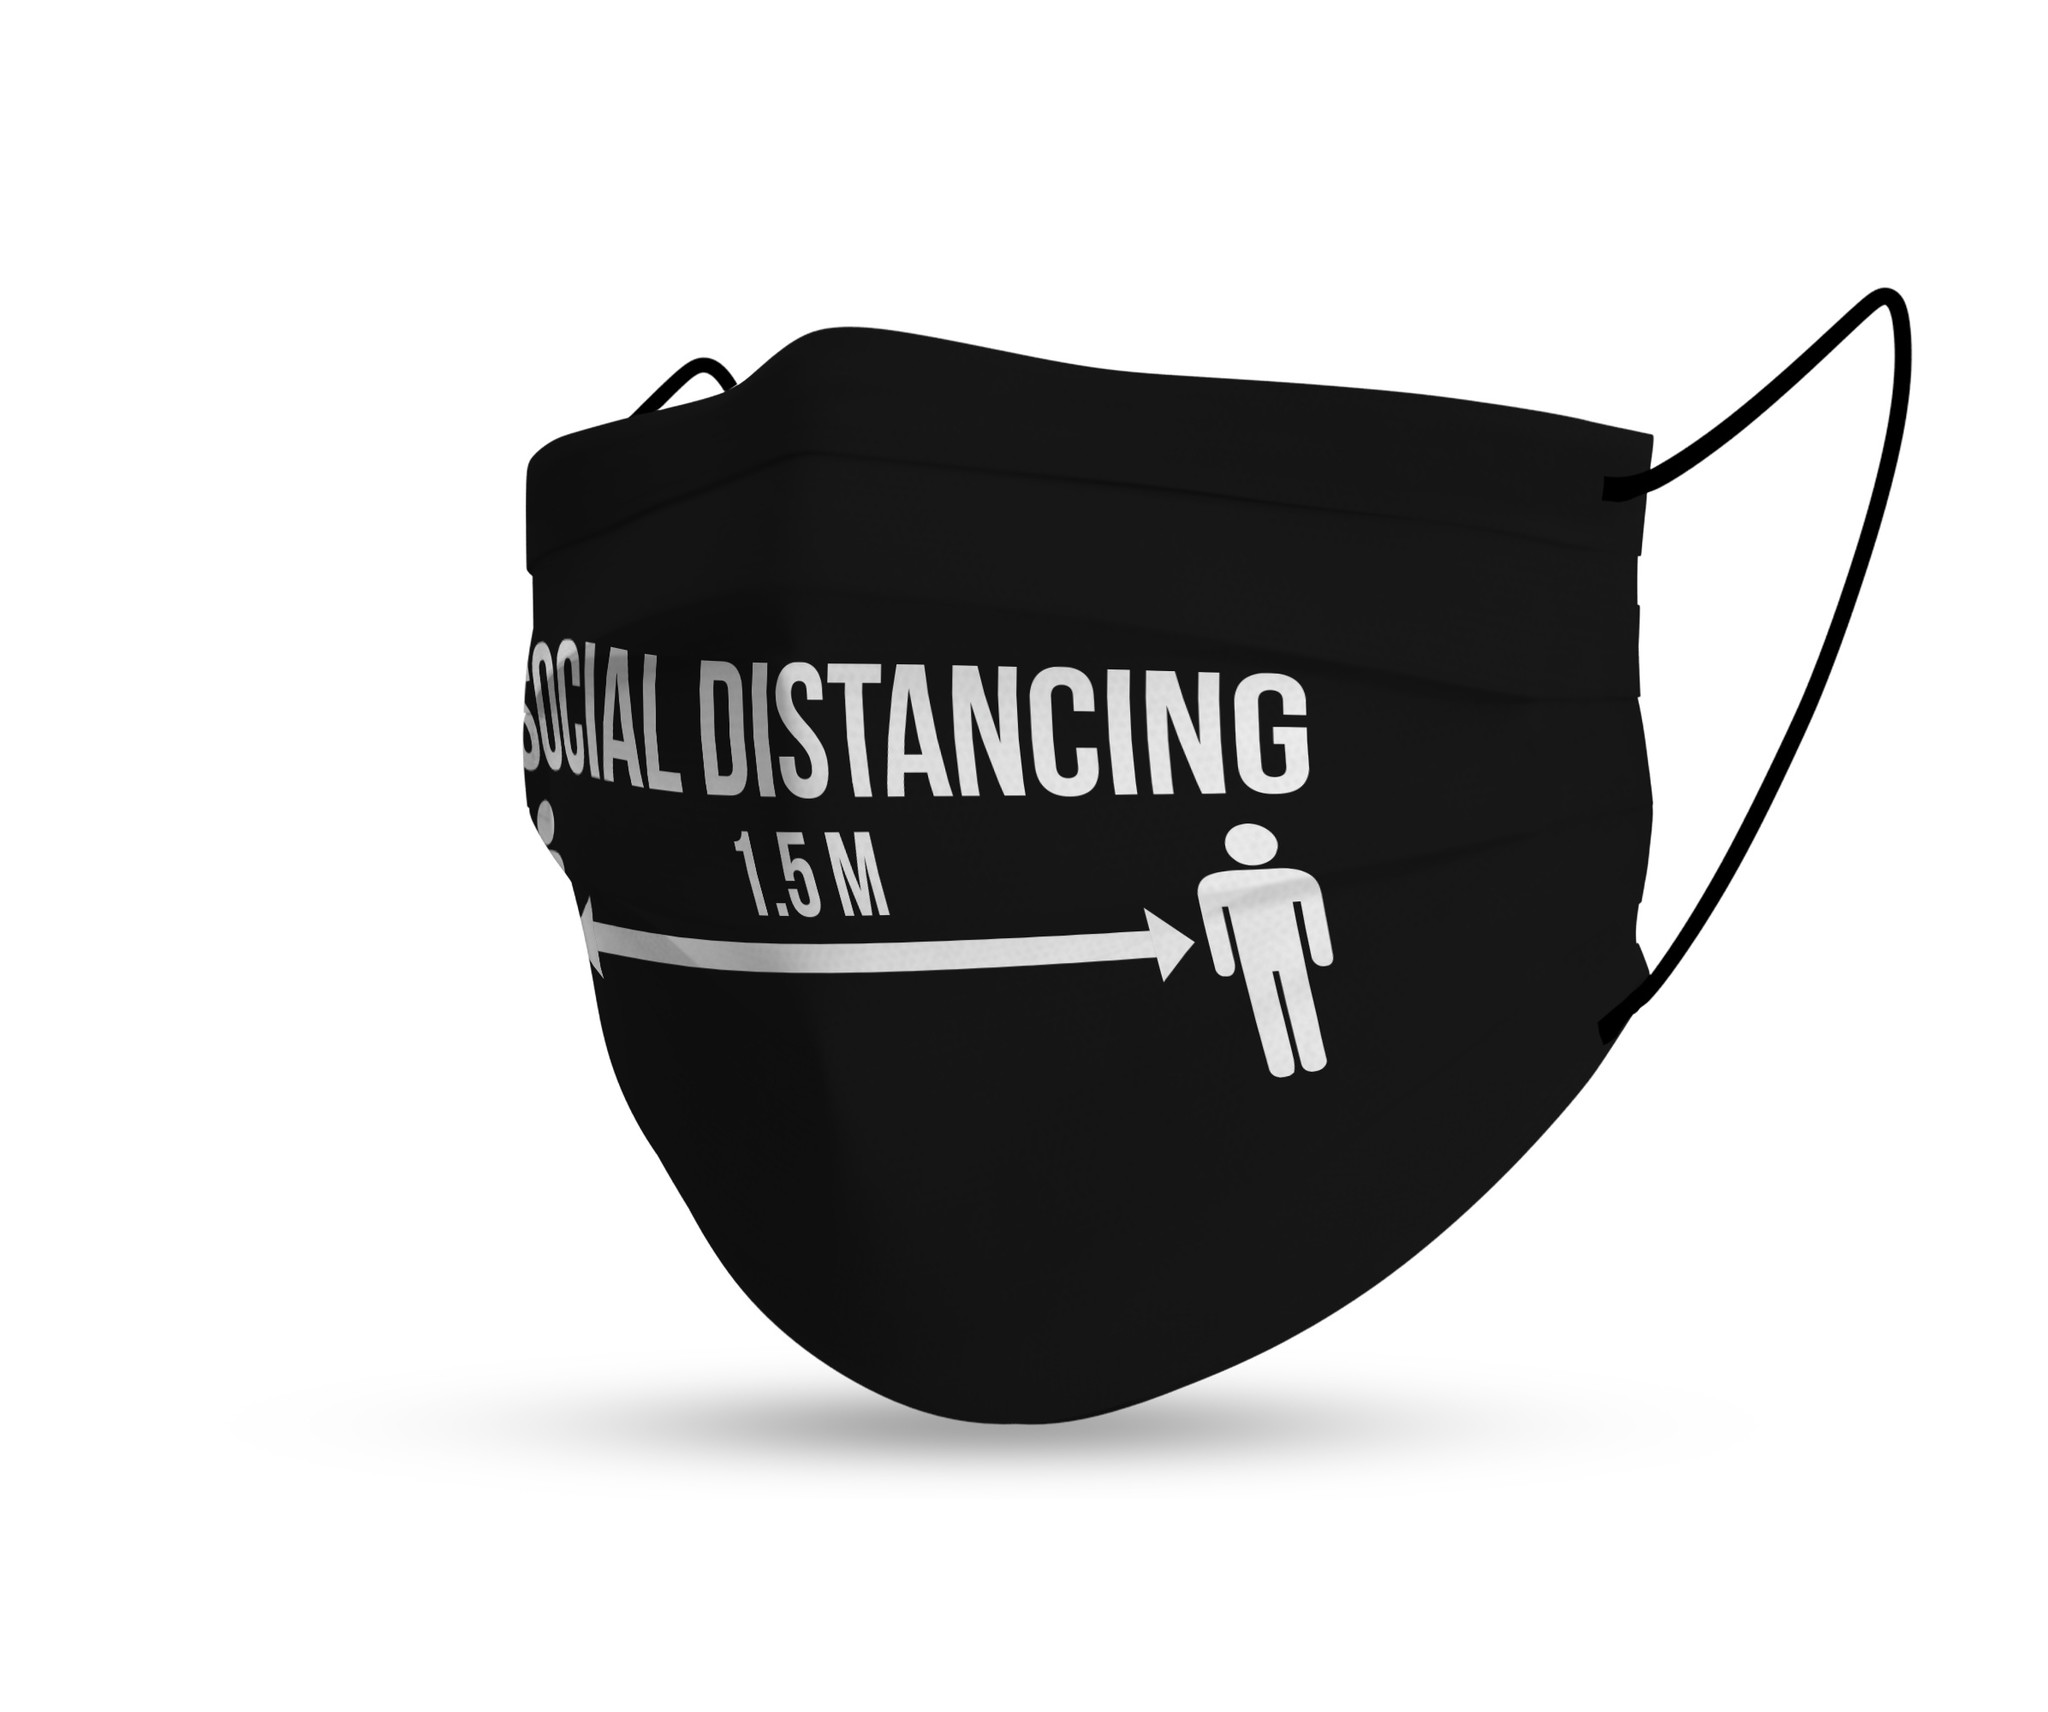 Topfanz Mondmasker Social Distancing 1,5m